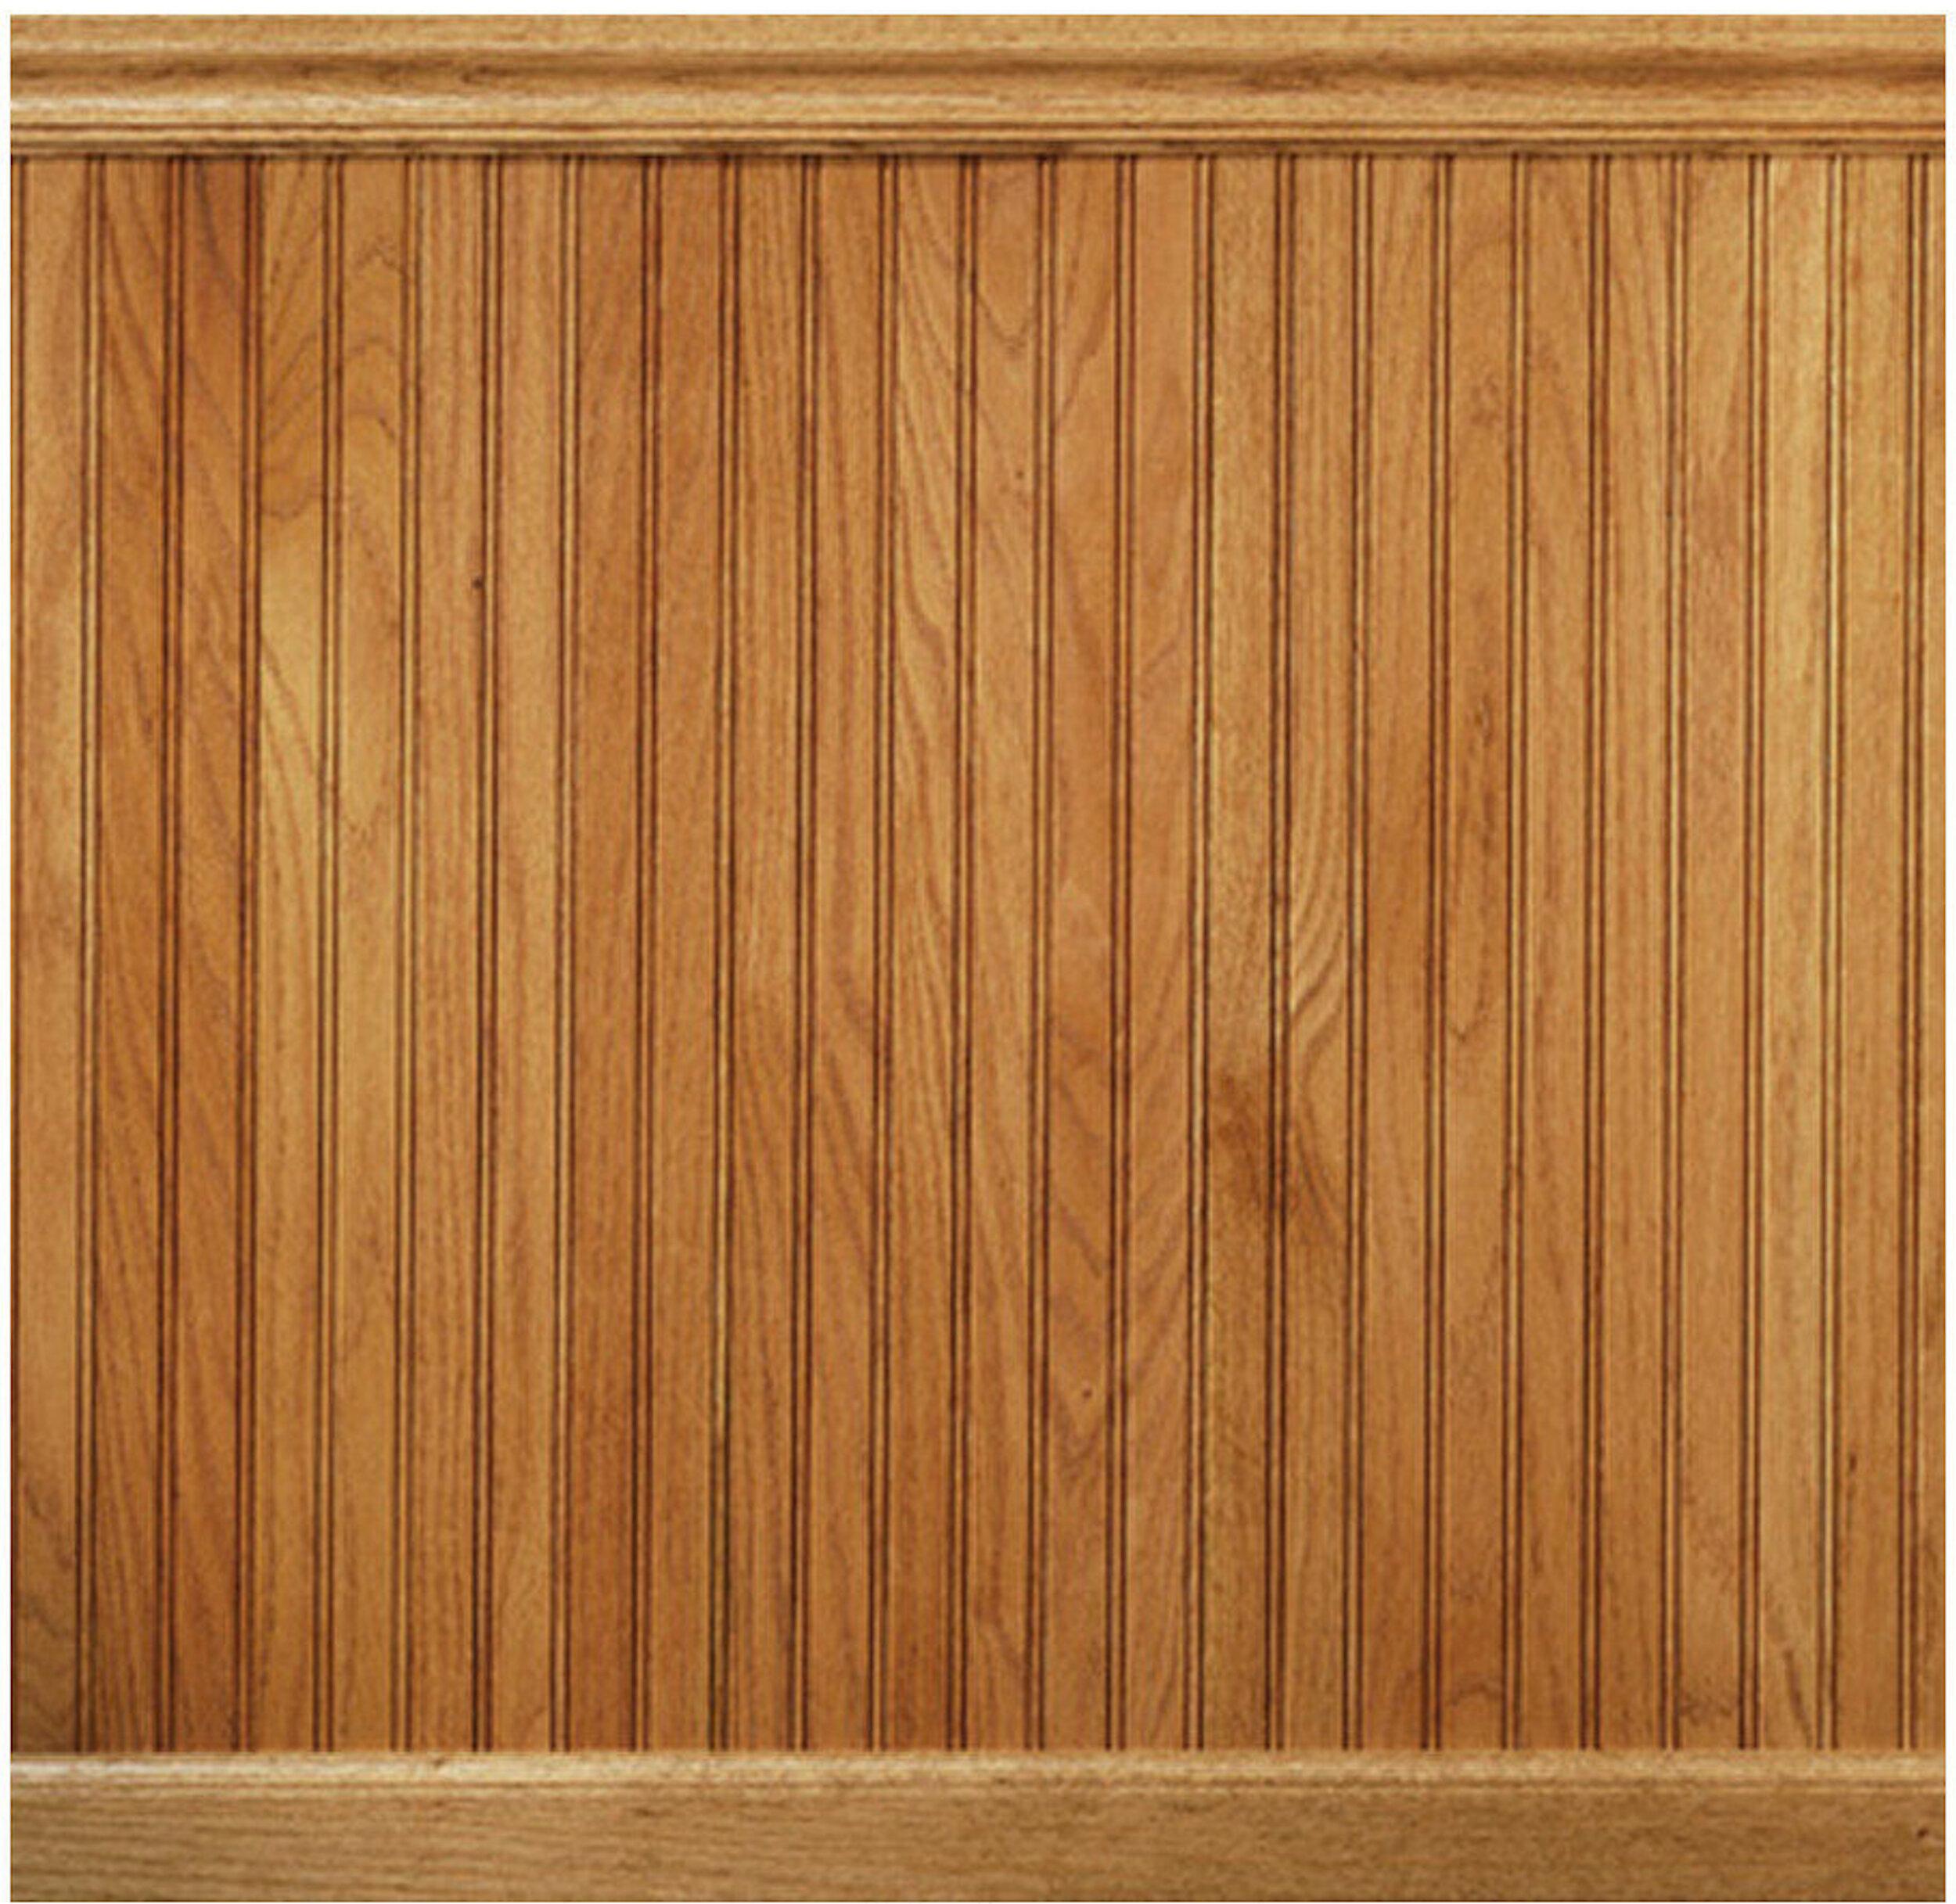 96 solid wood wall paneling in red oak rh wayfair com wood paneling for walls lowes wood paneling for walls home depot